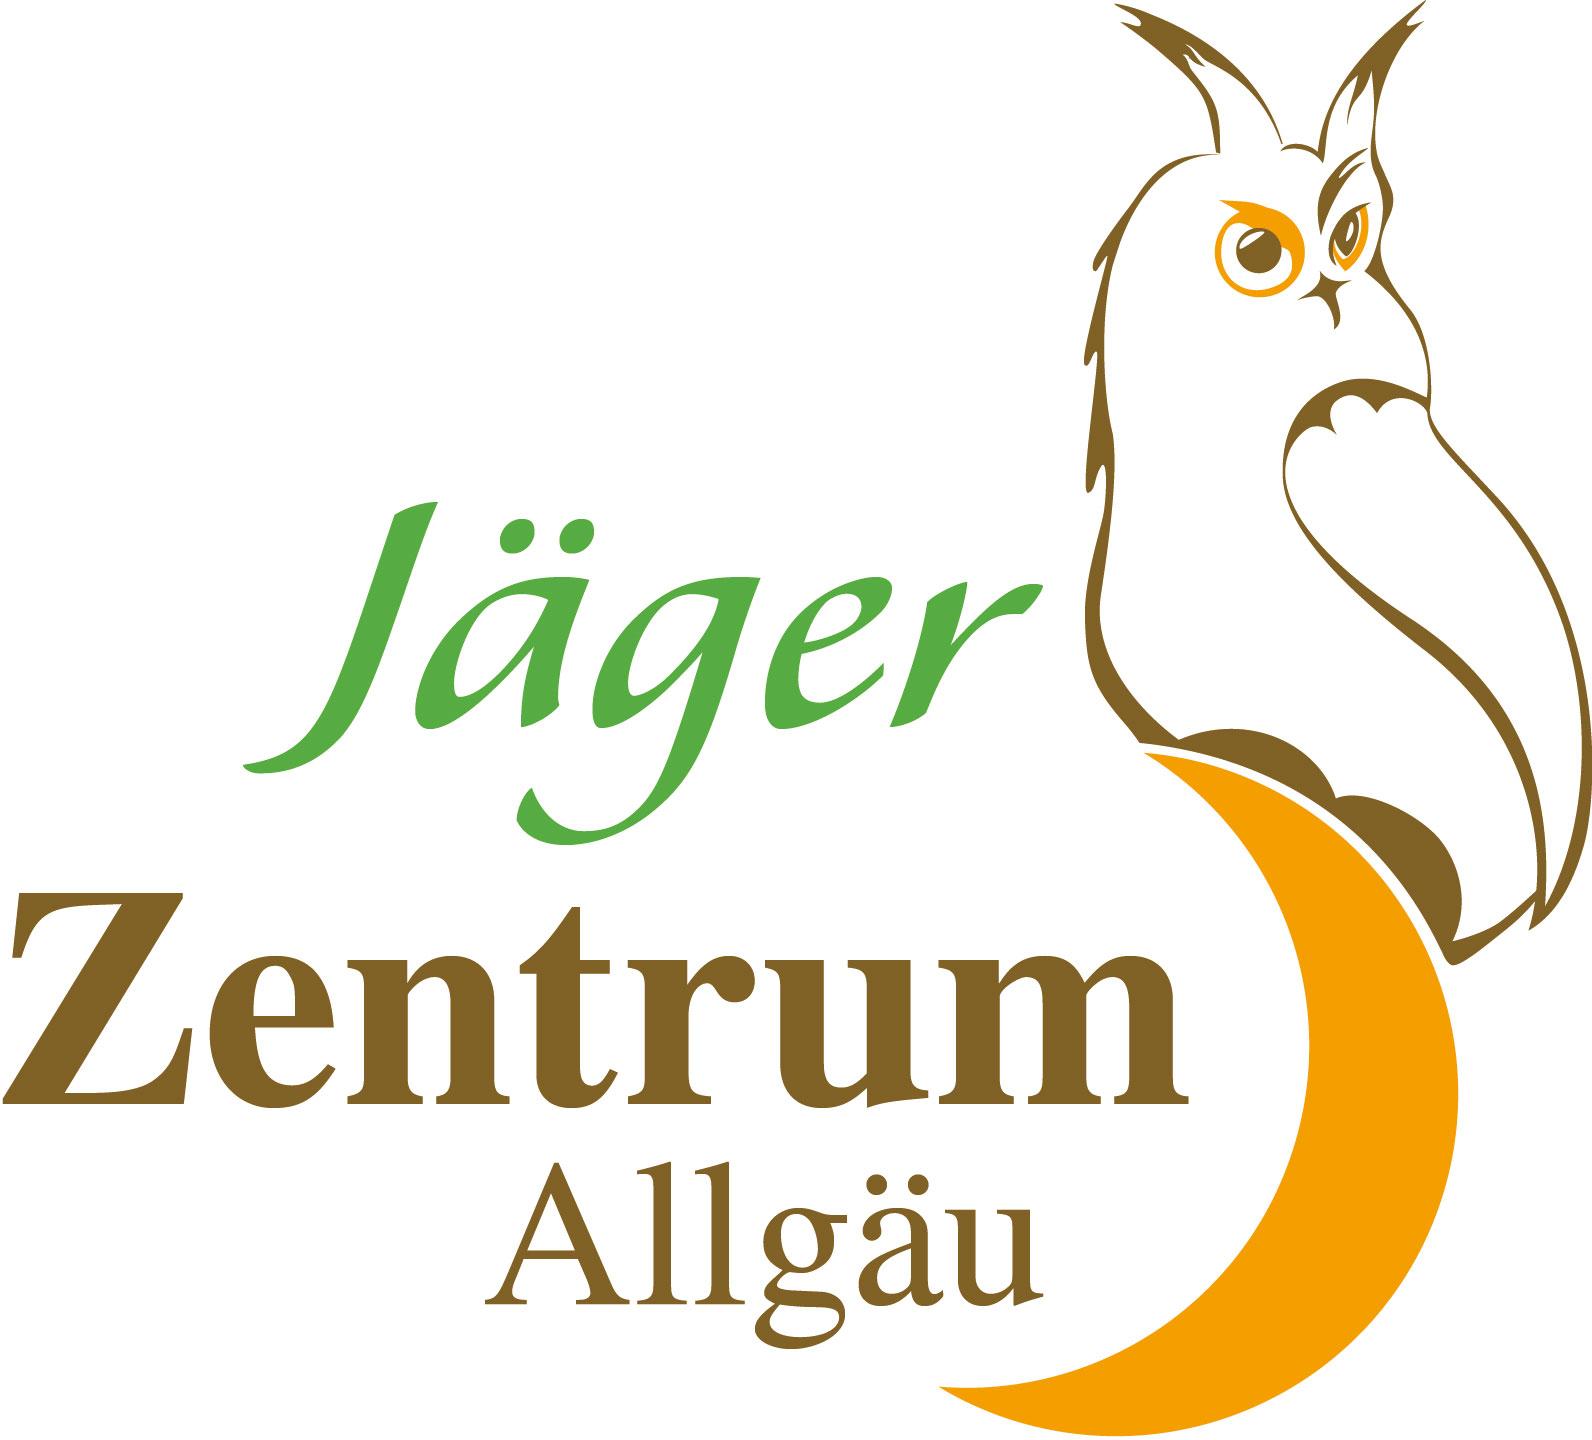 Jägerzentrum Allgäu